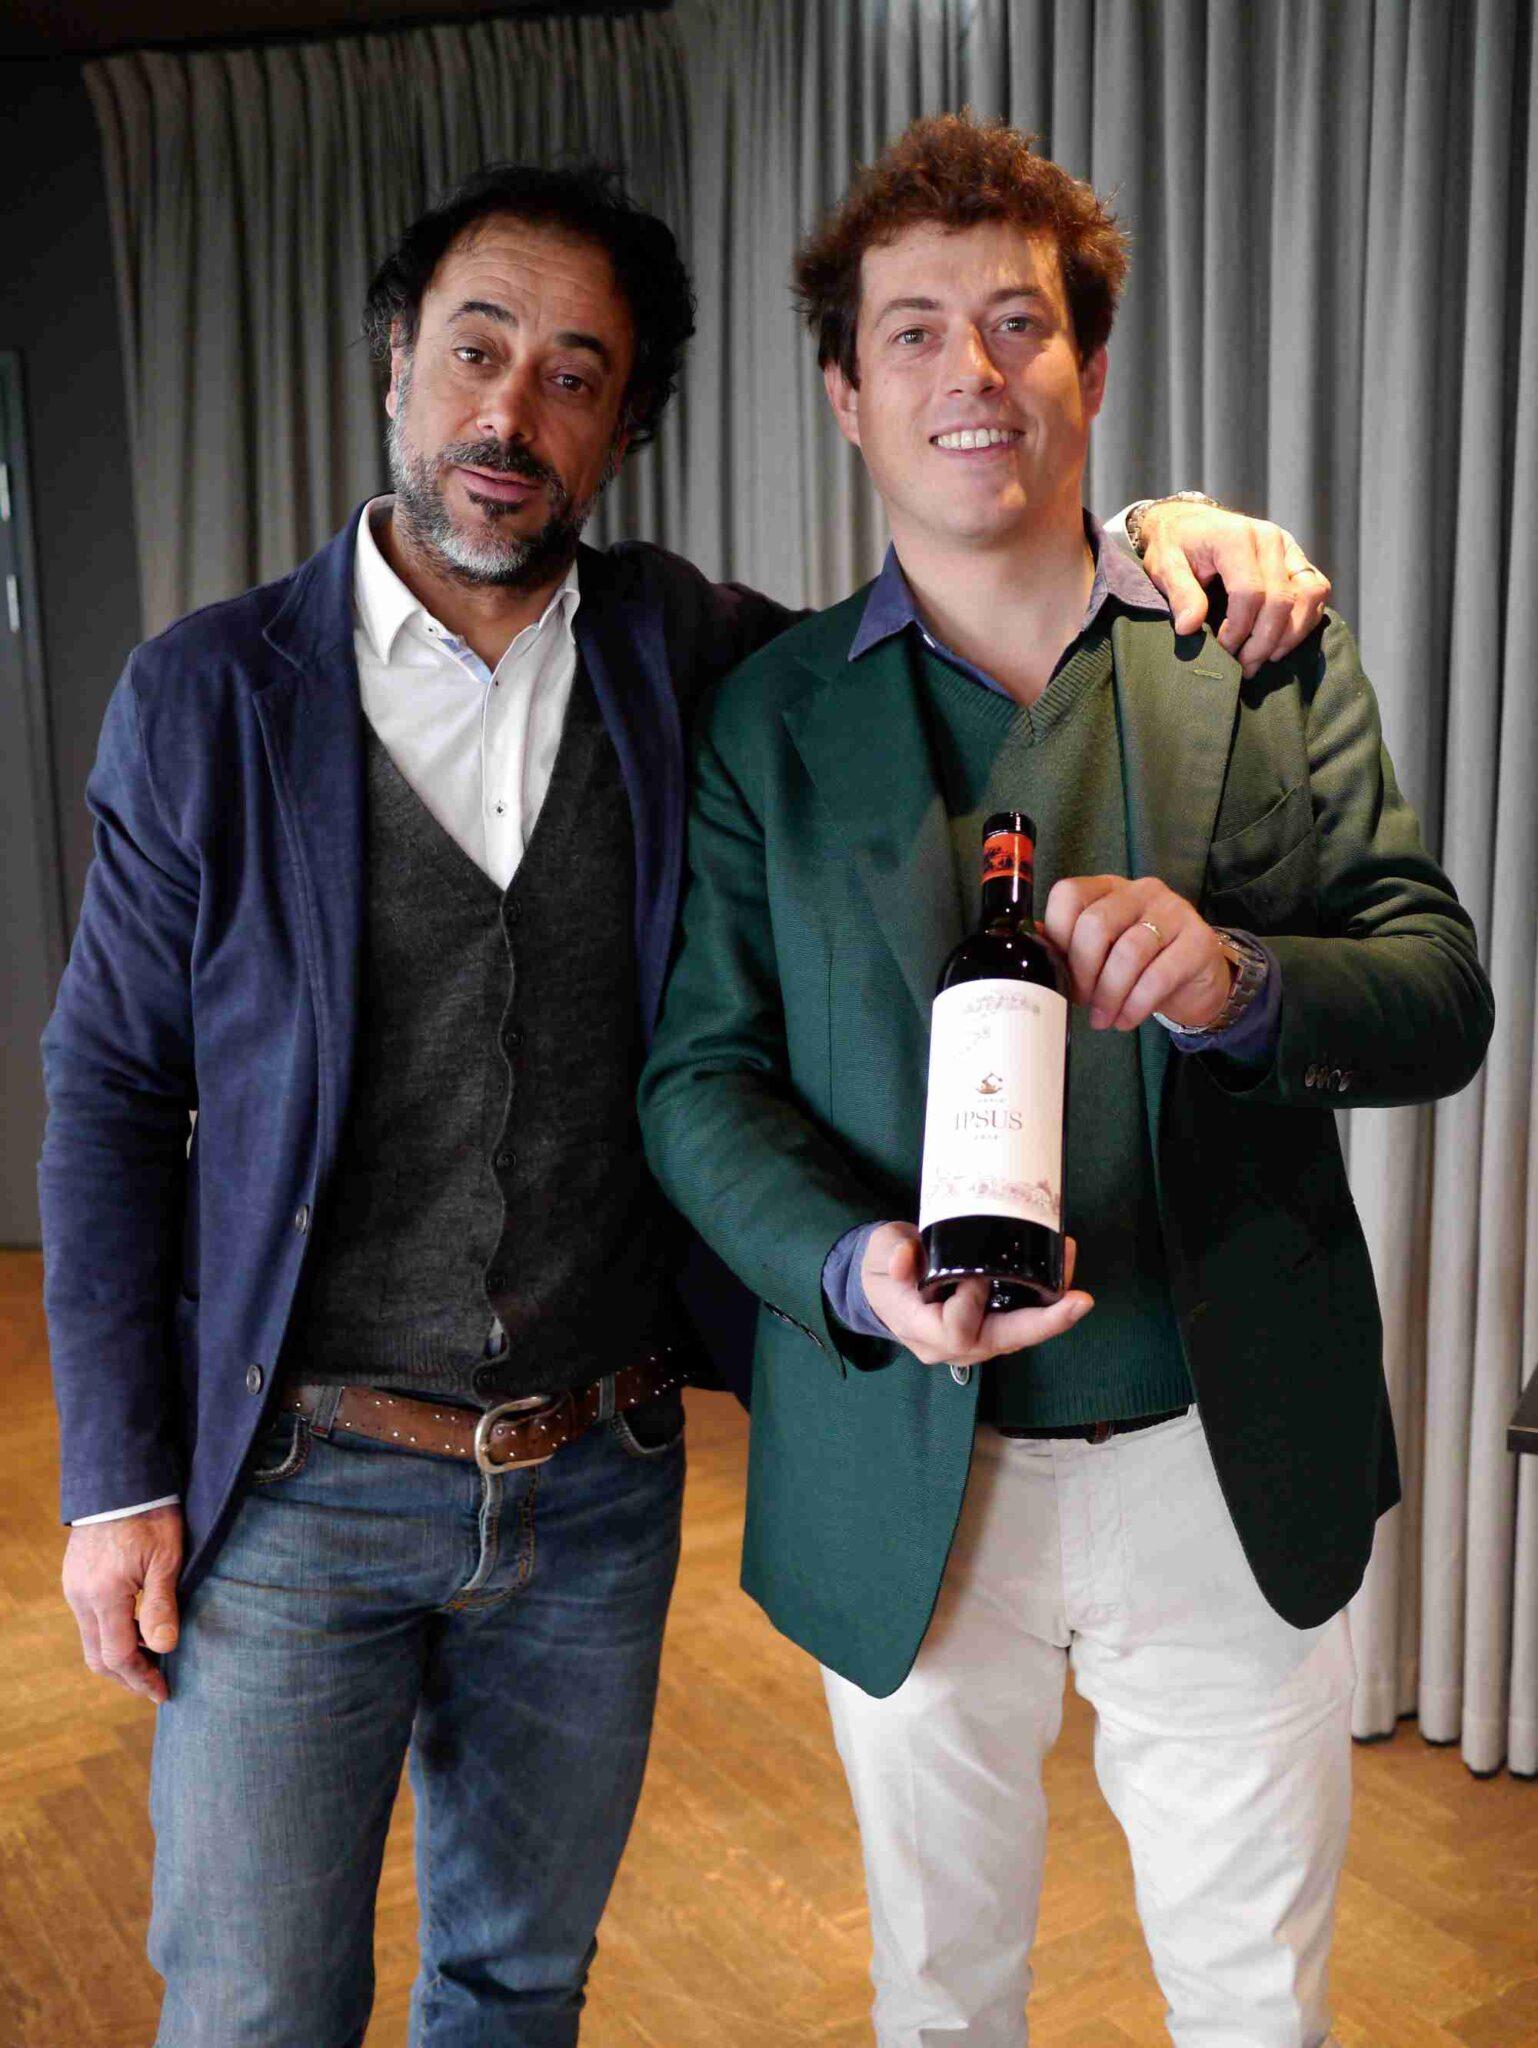 Winemaker Gionata Pulignani og Giovanni Mazzei præsenterede stolt familiens nye barn, Il Caggio IPSUS, en Chianti Classico Gran Selezione, der stræber efter at blive den bedste Chianti Classico nogensinde…